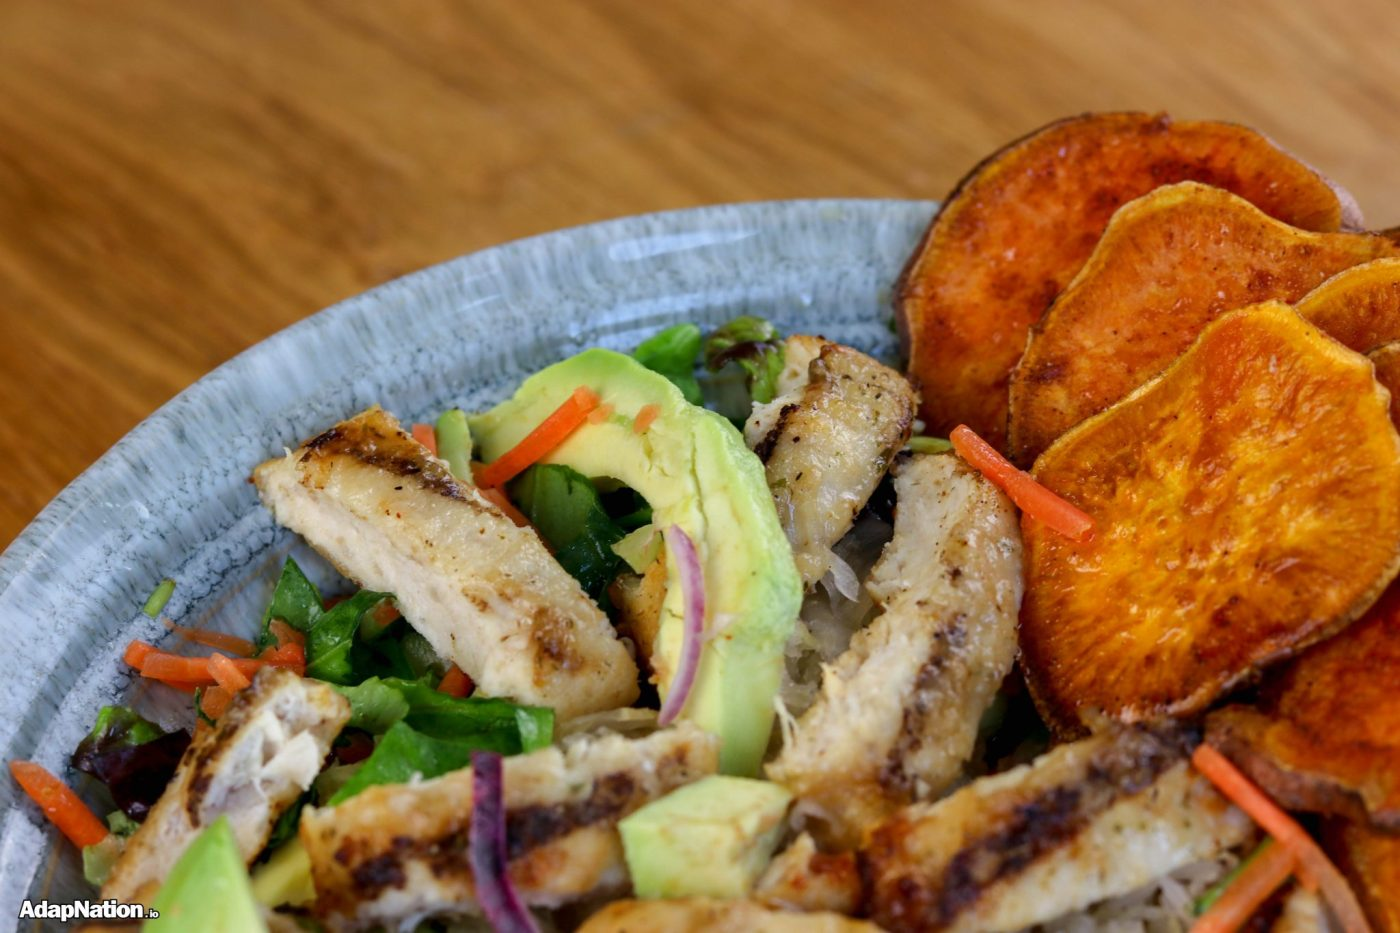 Chicken & Avo Salad with SP Crisps